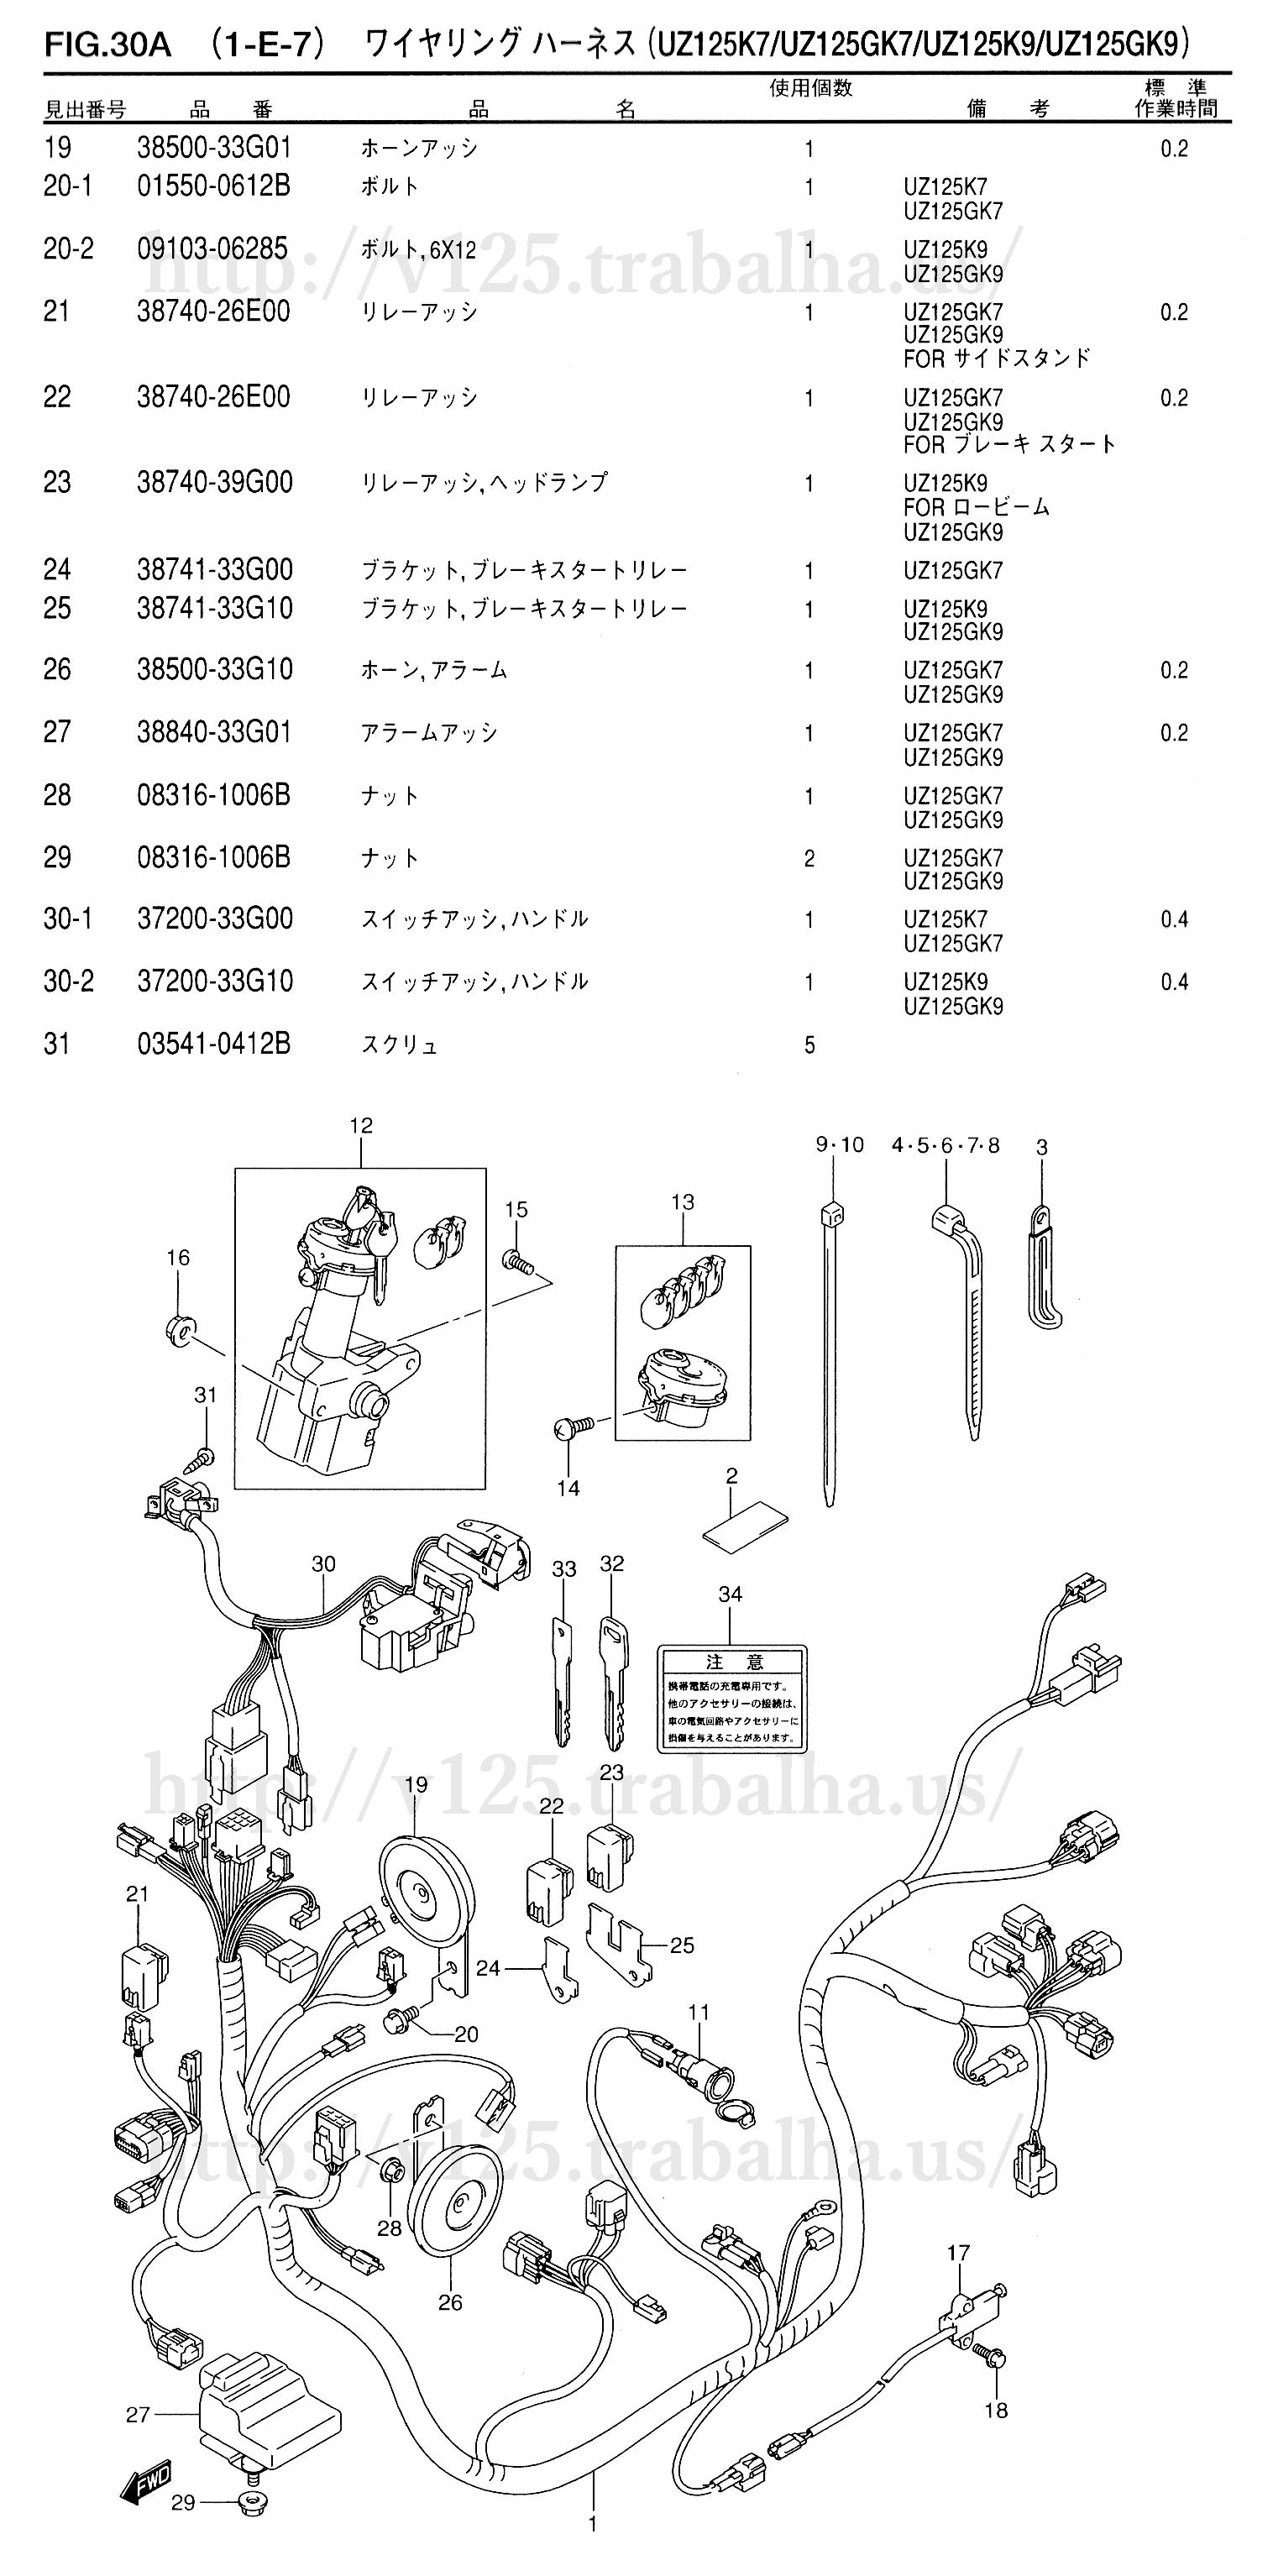 FIG.30A(1-E-7)ワイヤリング ハーネス(UZ125K7/UZ125GK7/UZ125K9/UZ125GK9)